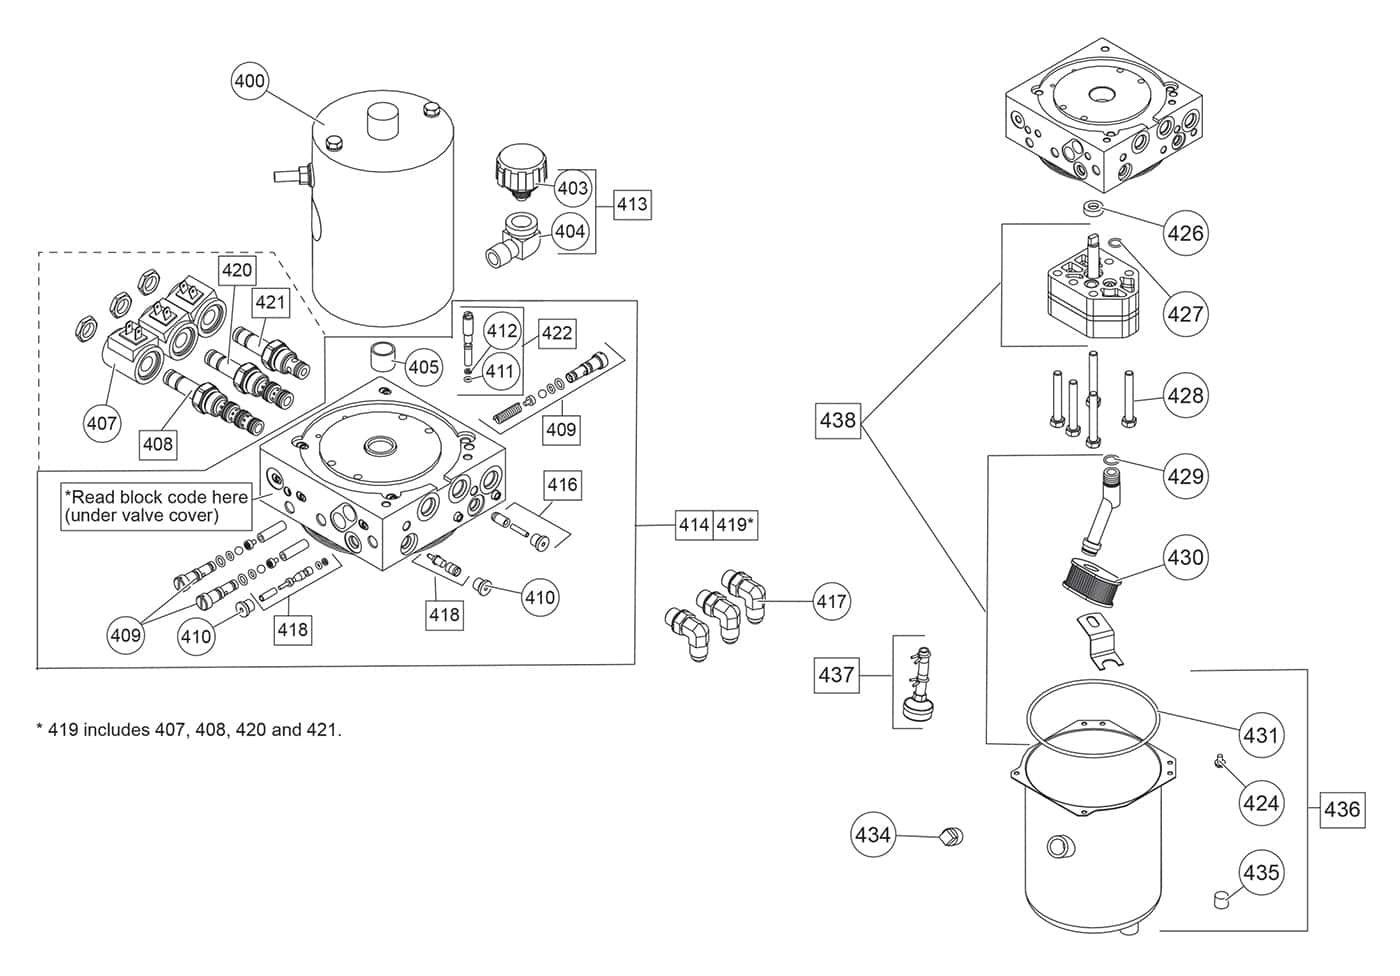 Hydrolic Diagram International 404 Schematics Wiring Diagrams 424 Fisher Hd Series Hydraulic Parts Iteparts Com Rh